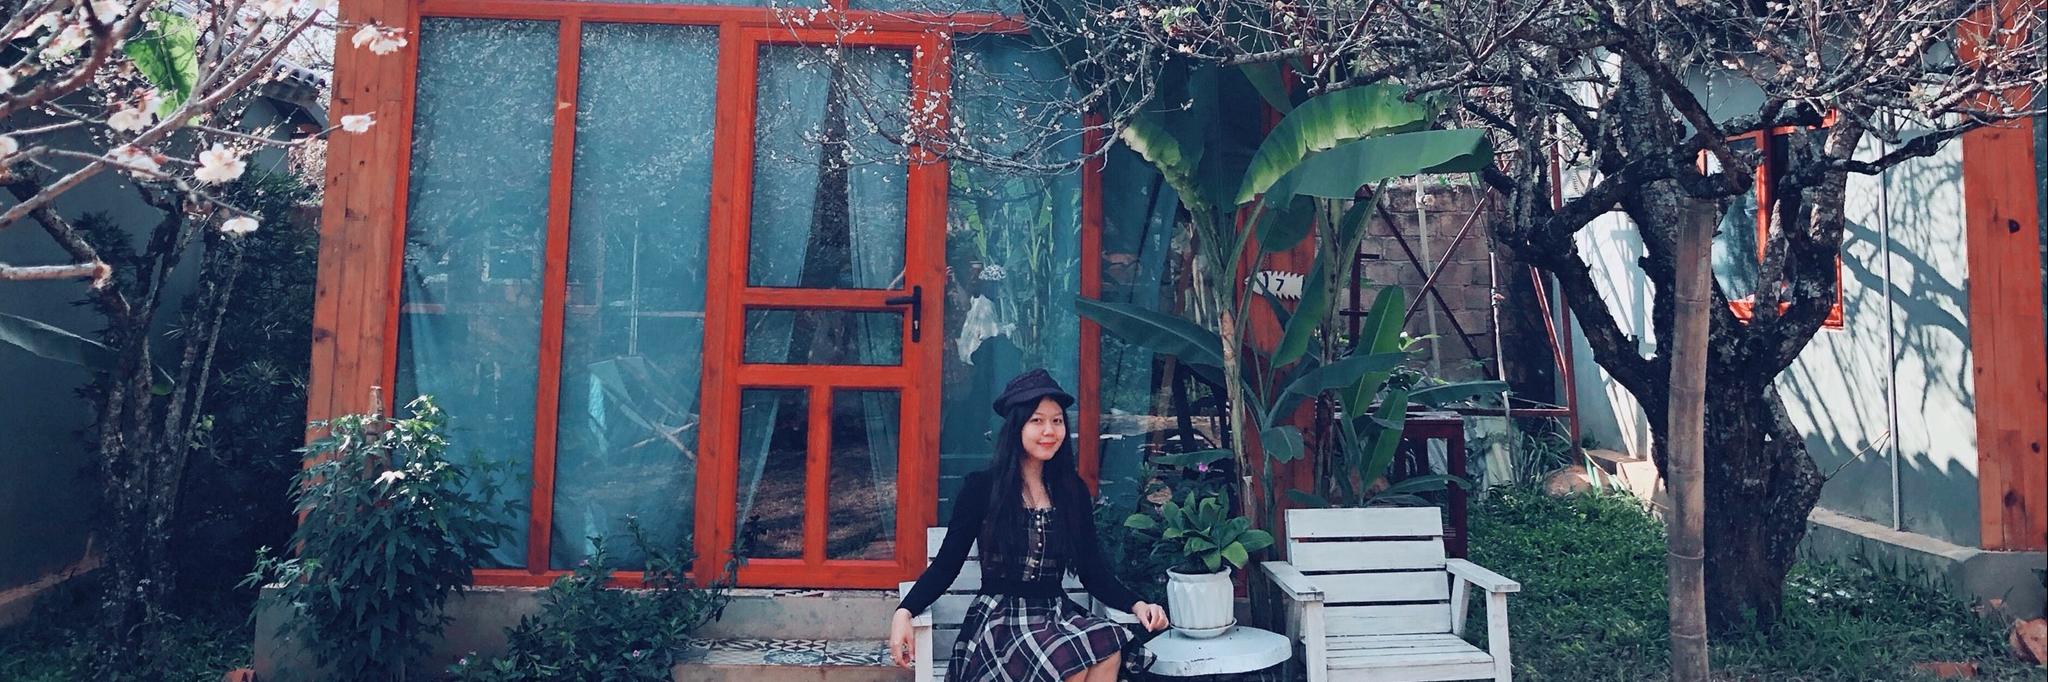 https://gody.vn/blog/khanhvan14054027/post/hanh-trinh-8-ngay-7-dem-kham-pha-mien-tay-bac-p2-8187